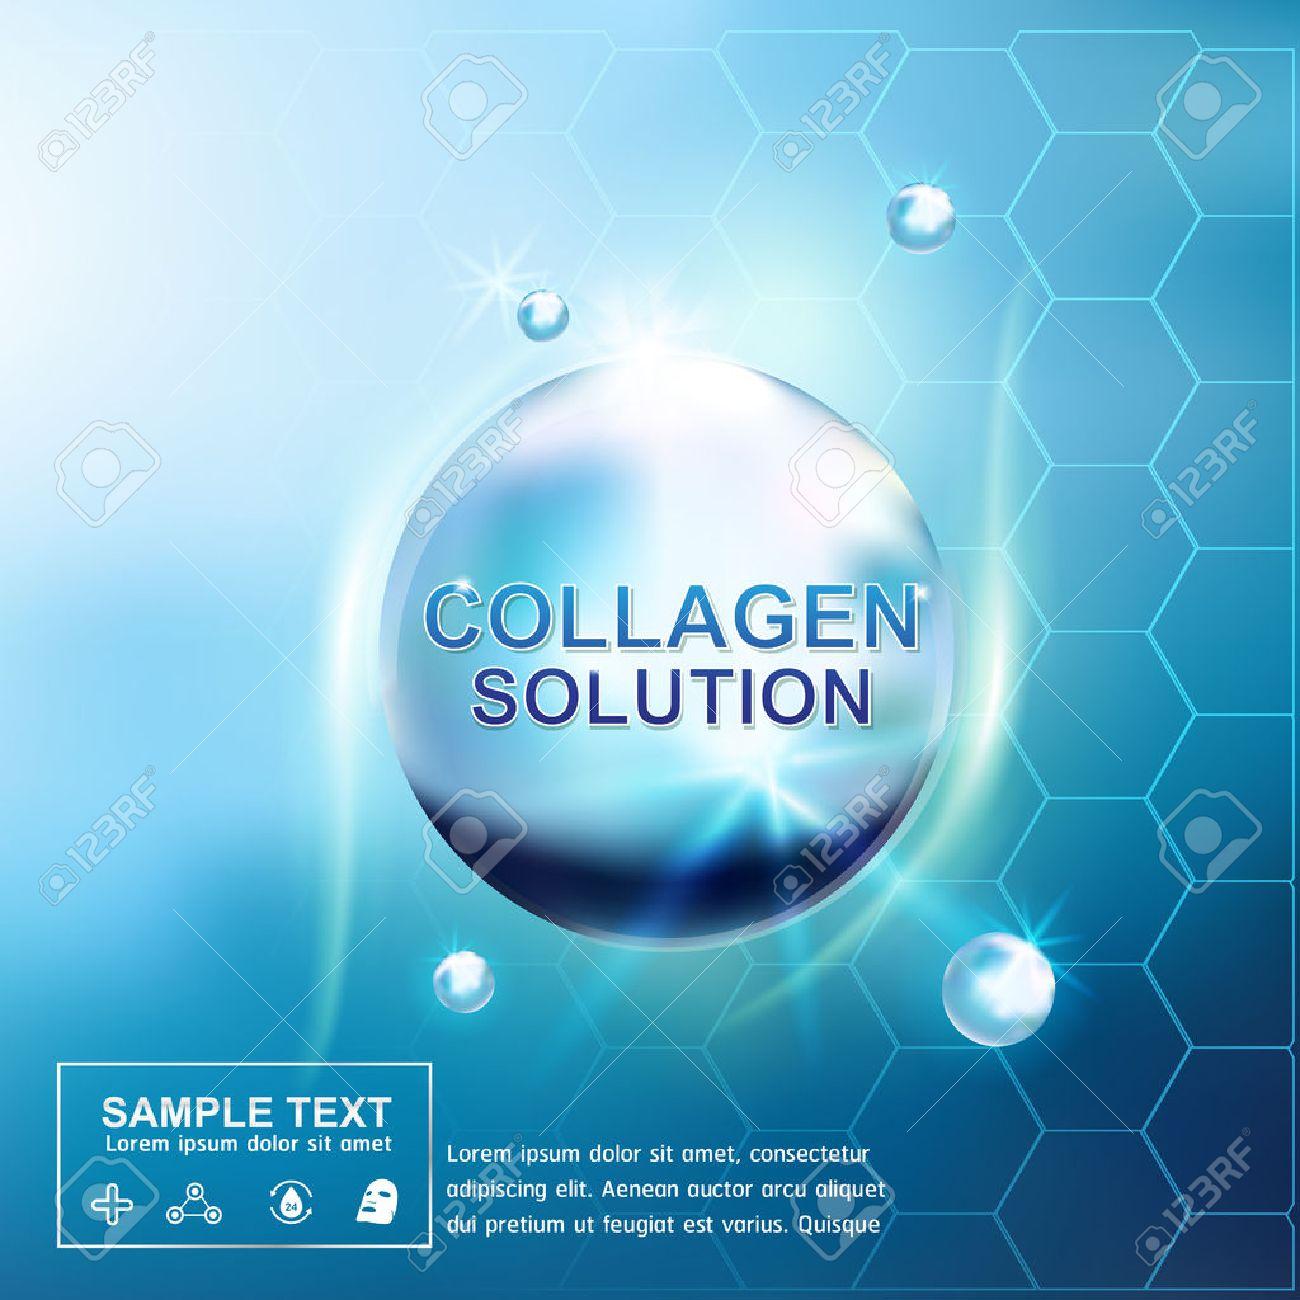 http://n3.datasn.io/data/api/v1/n3zm/image_of_skin_disease_5/by_table/skin_disease_image_download_access/4e/17/a3/fd/4e17a3fd8135366870db4a141e862e26a1d694da.jpg